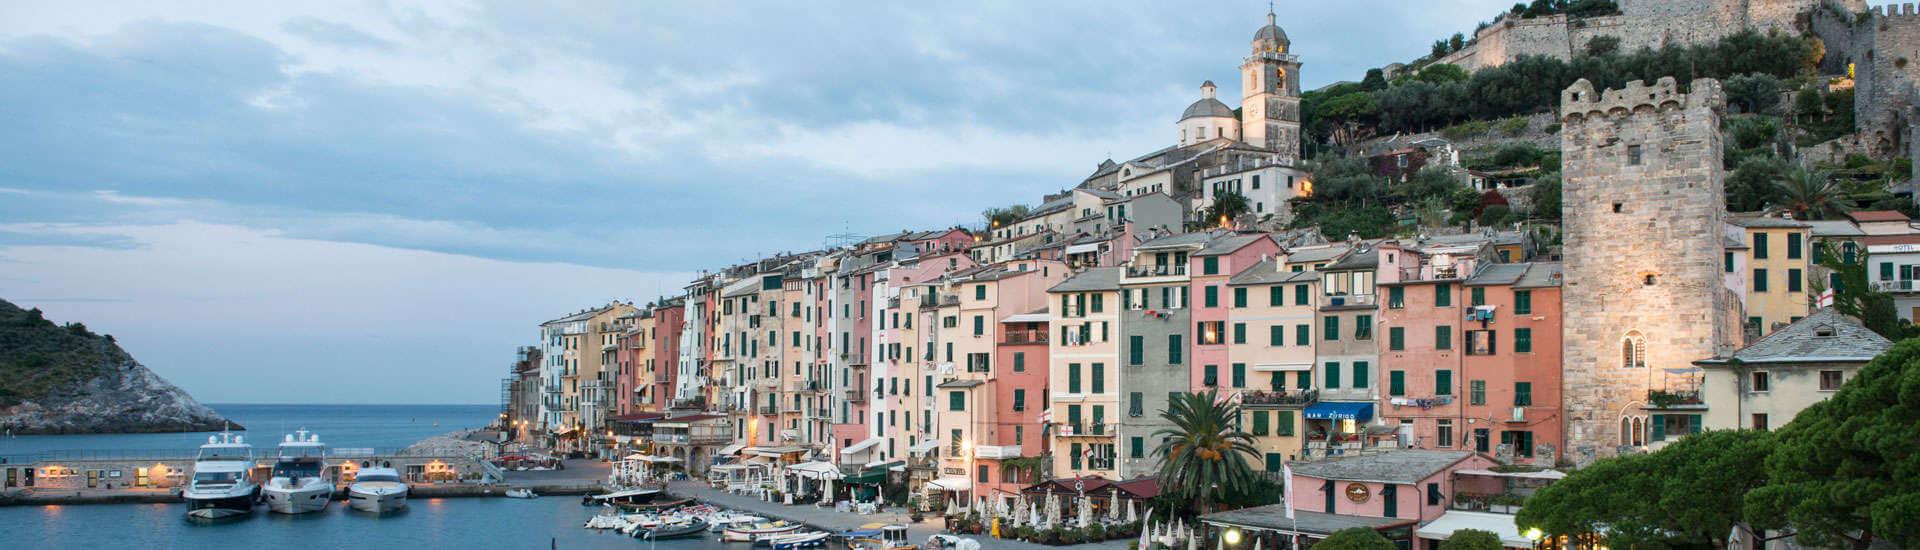 Romantic wedding in Portovenere, Liguria